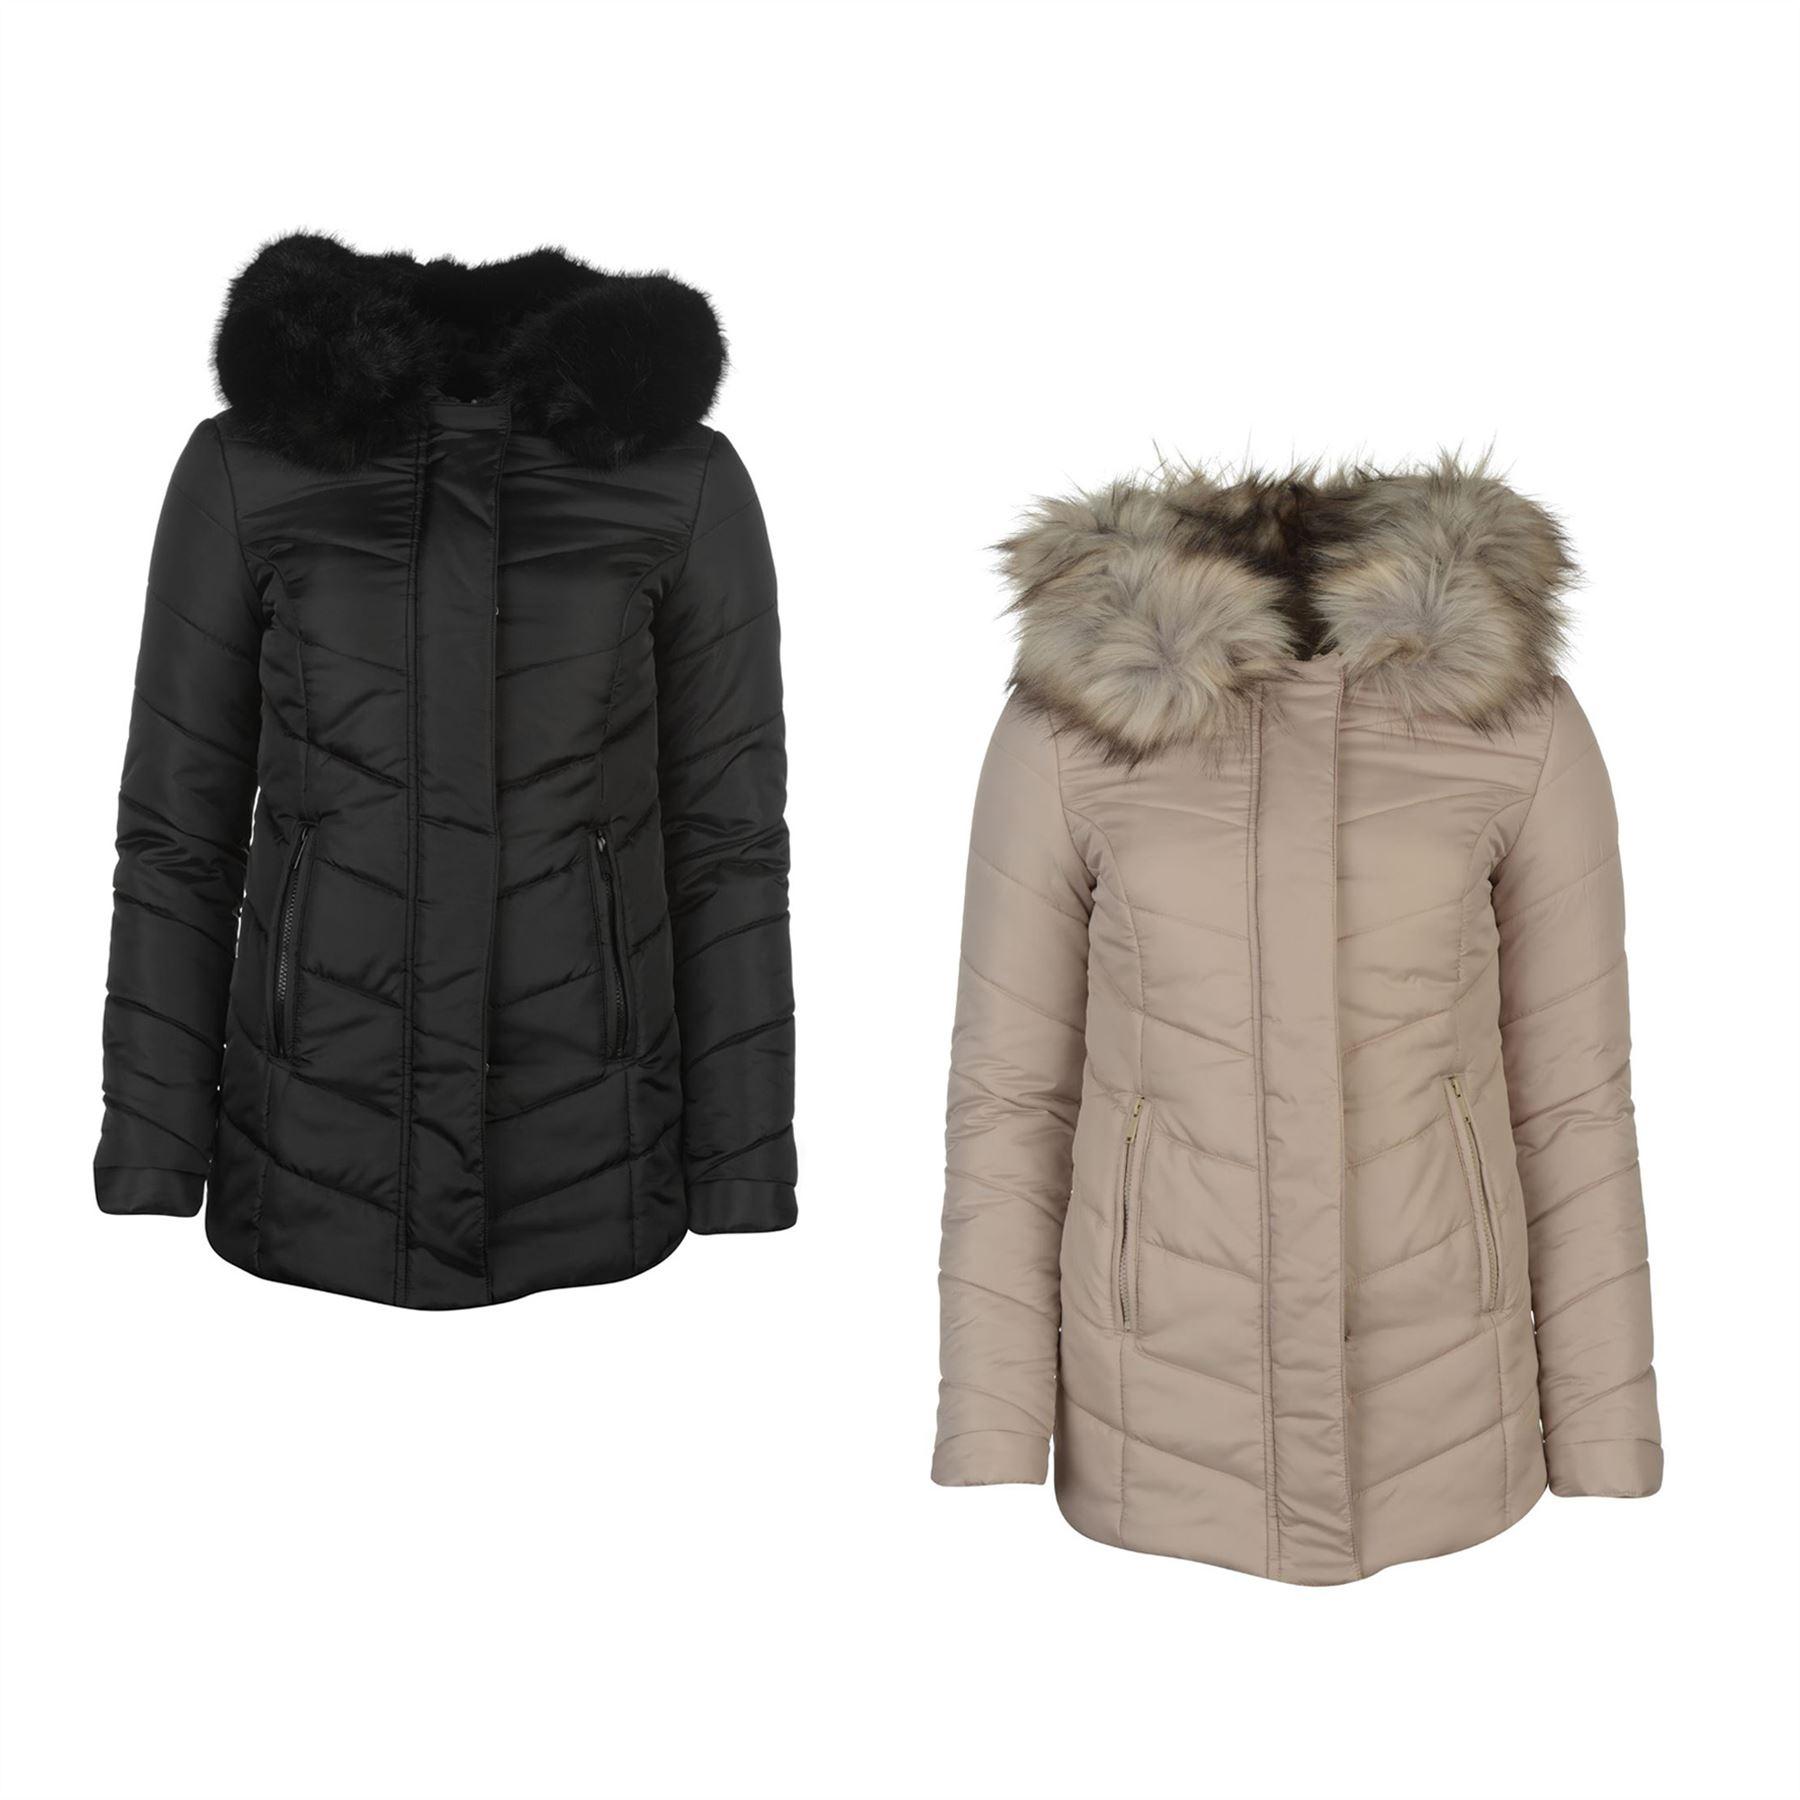 80d83352c Details about Firetrap Blackseal Short Padded Jacket Womens Coats Outerwear